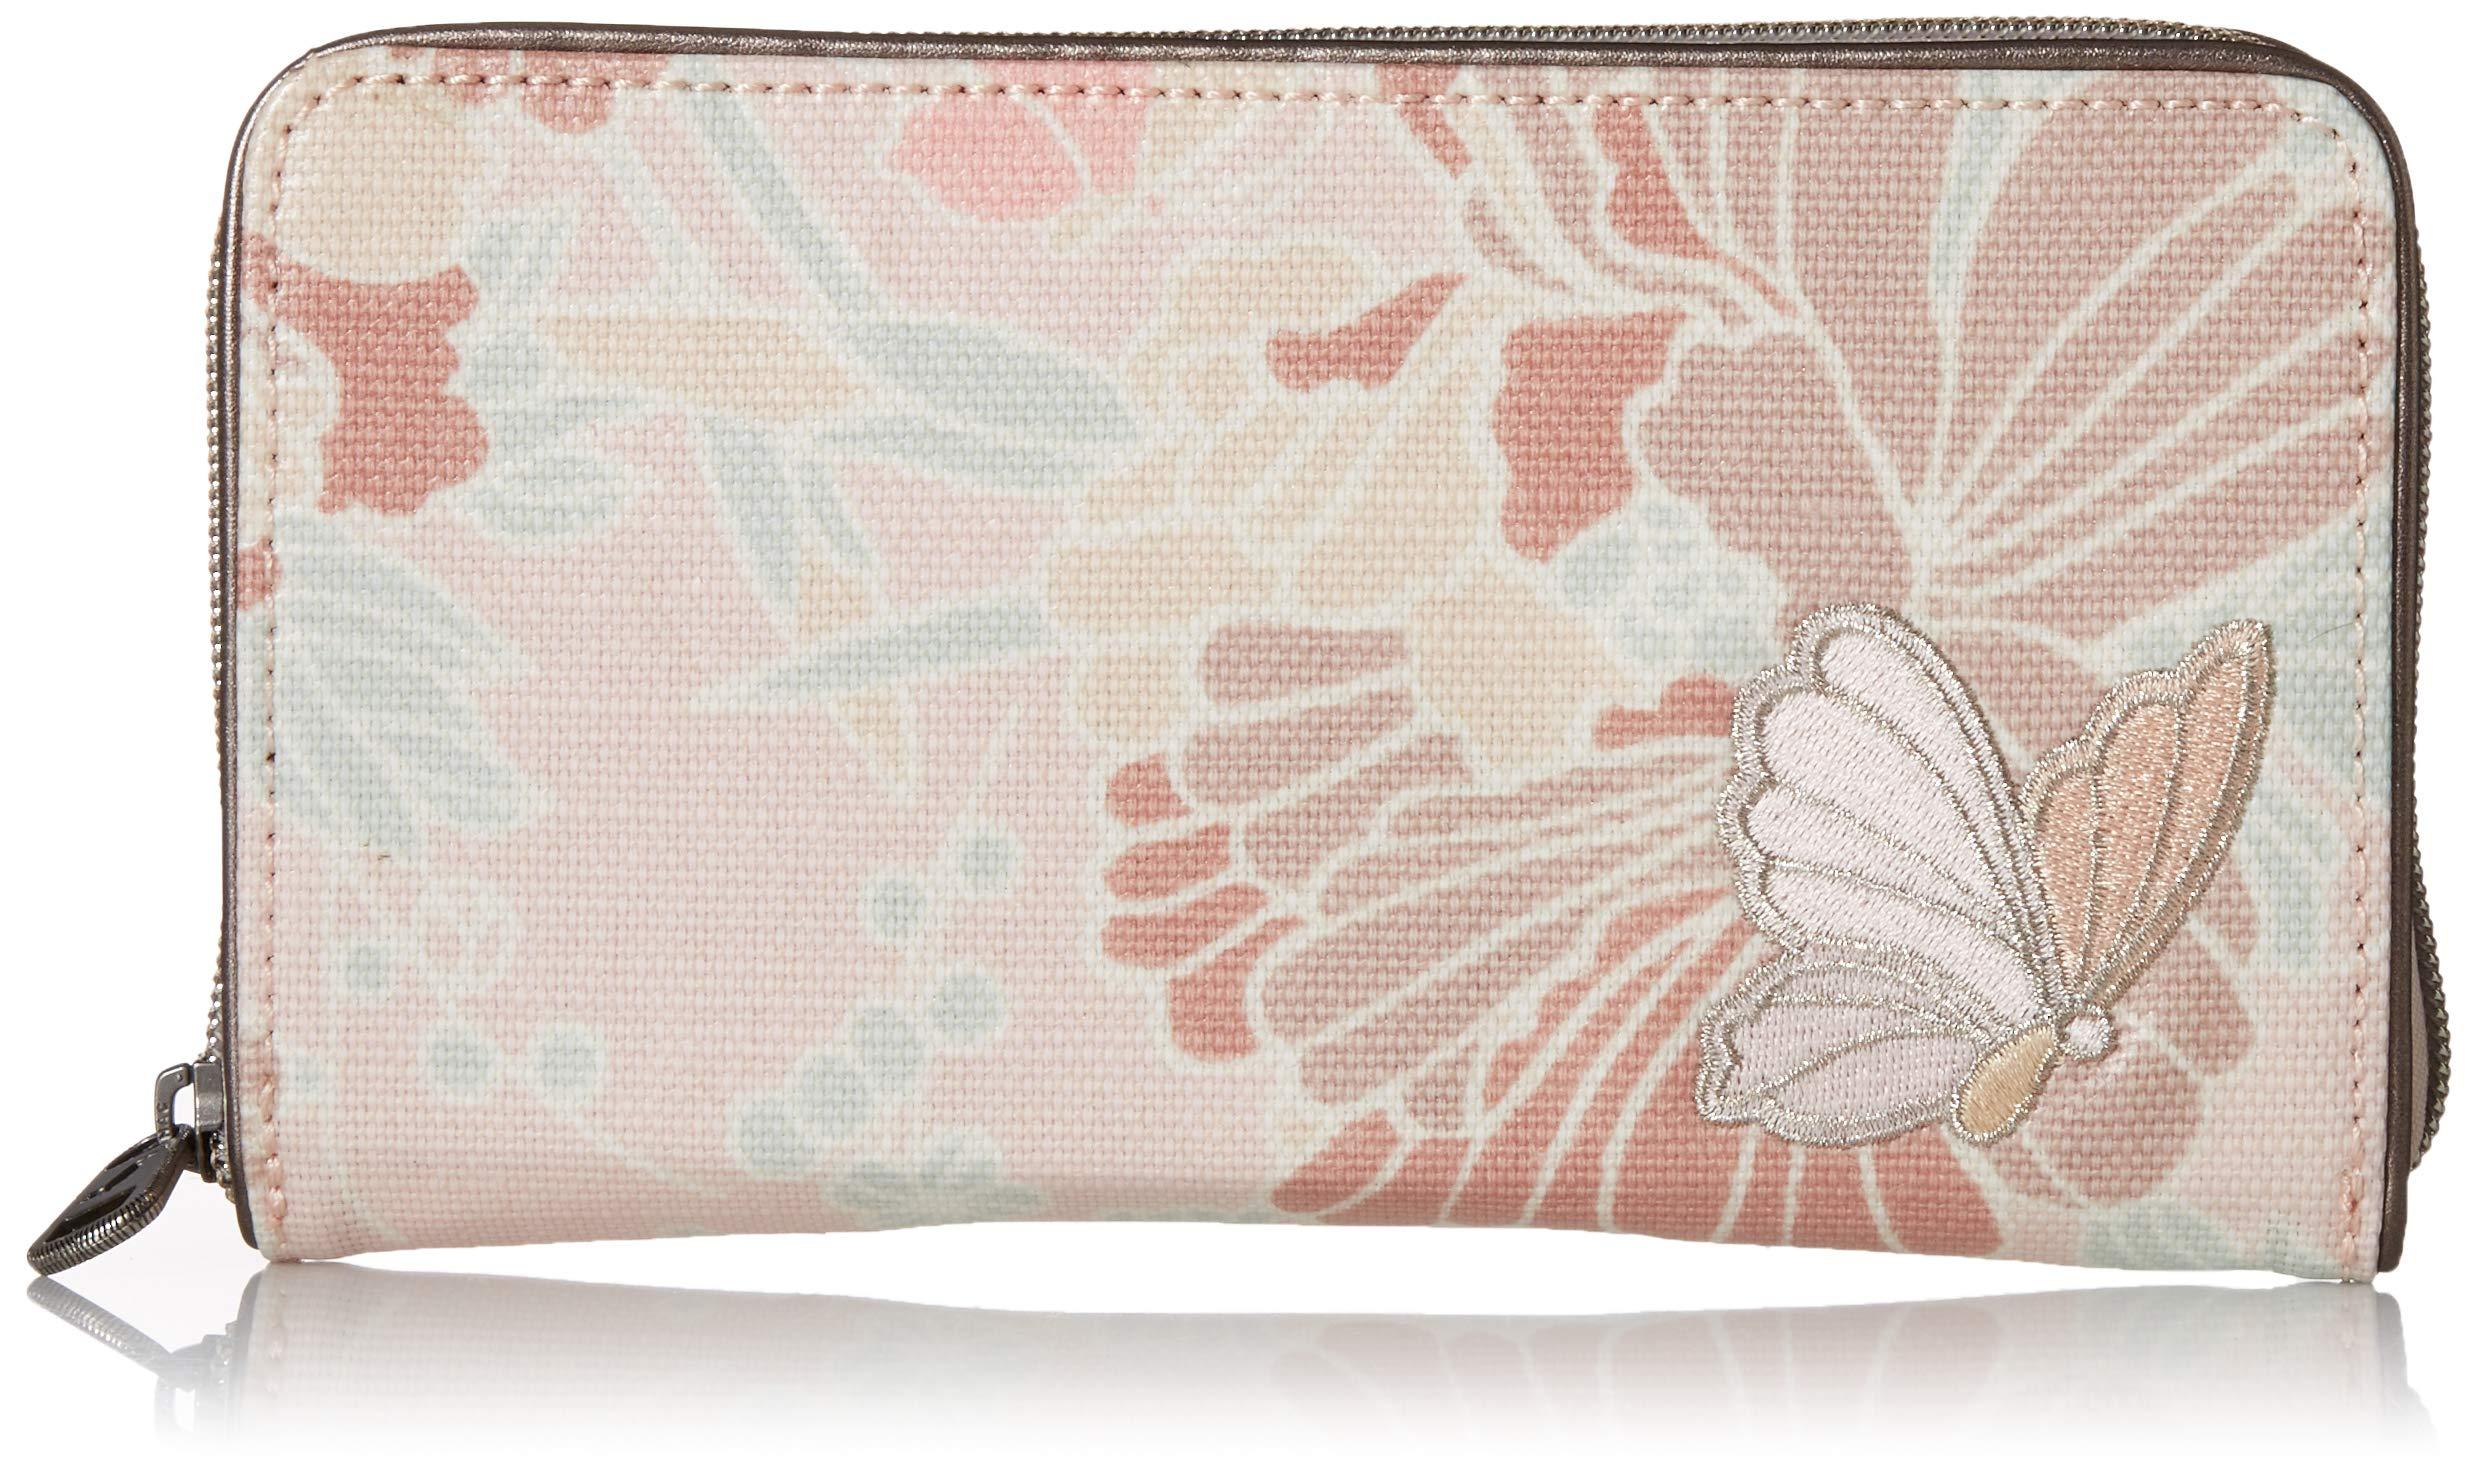 Sakroots Unisex-adults Large Zip Around Wallet, Petal Pink Flower Blossoms